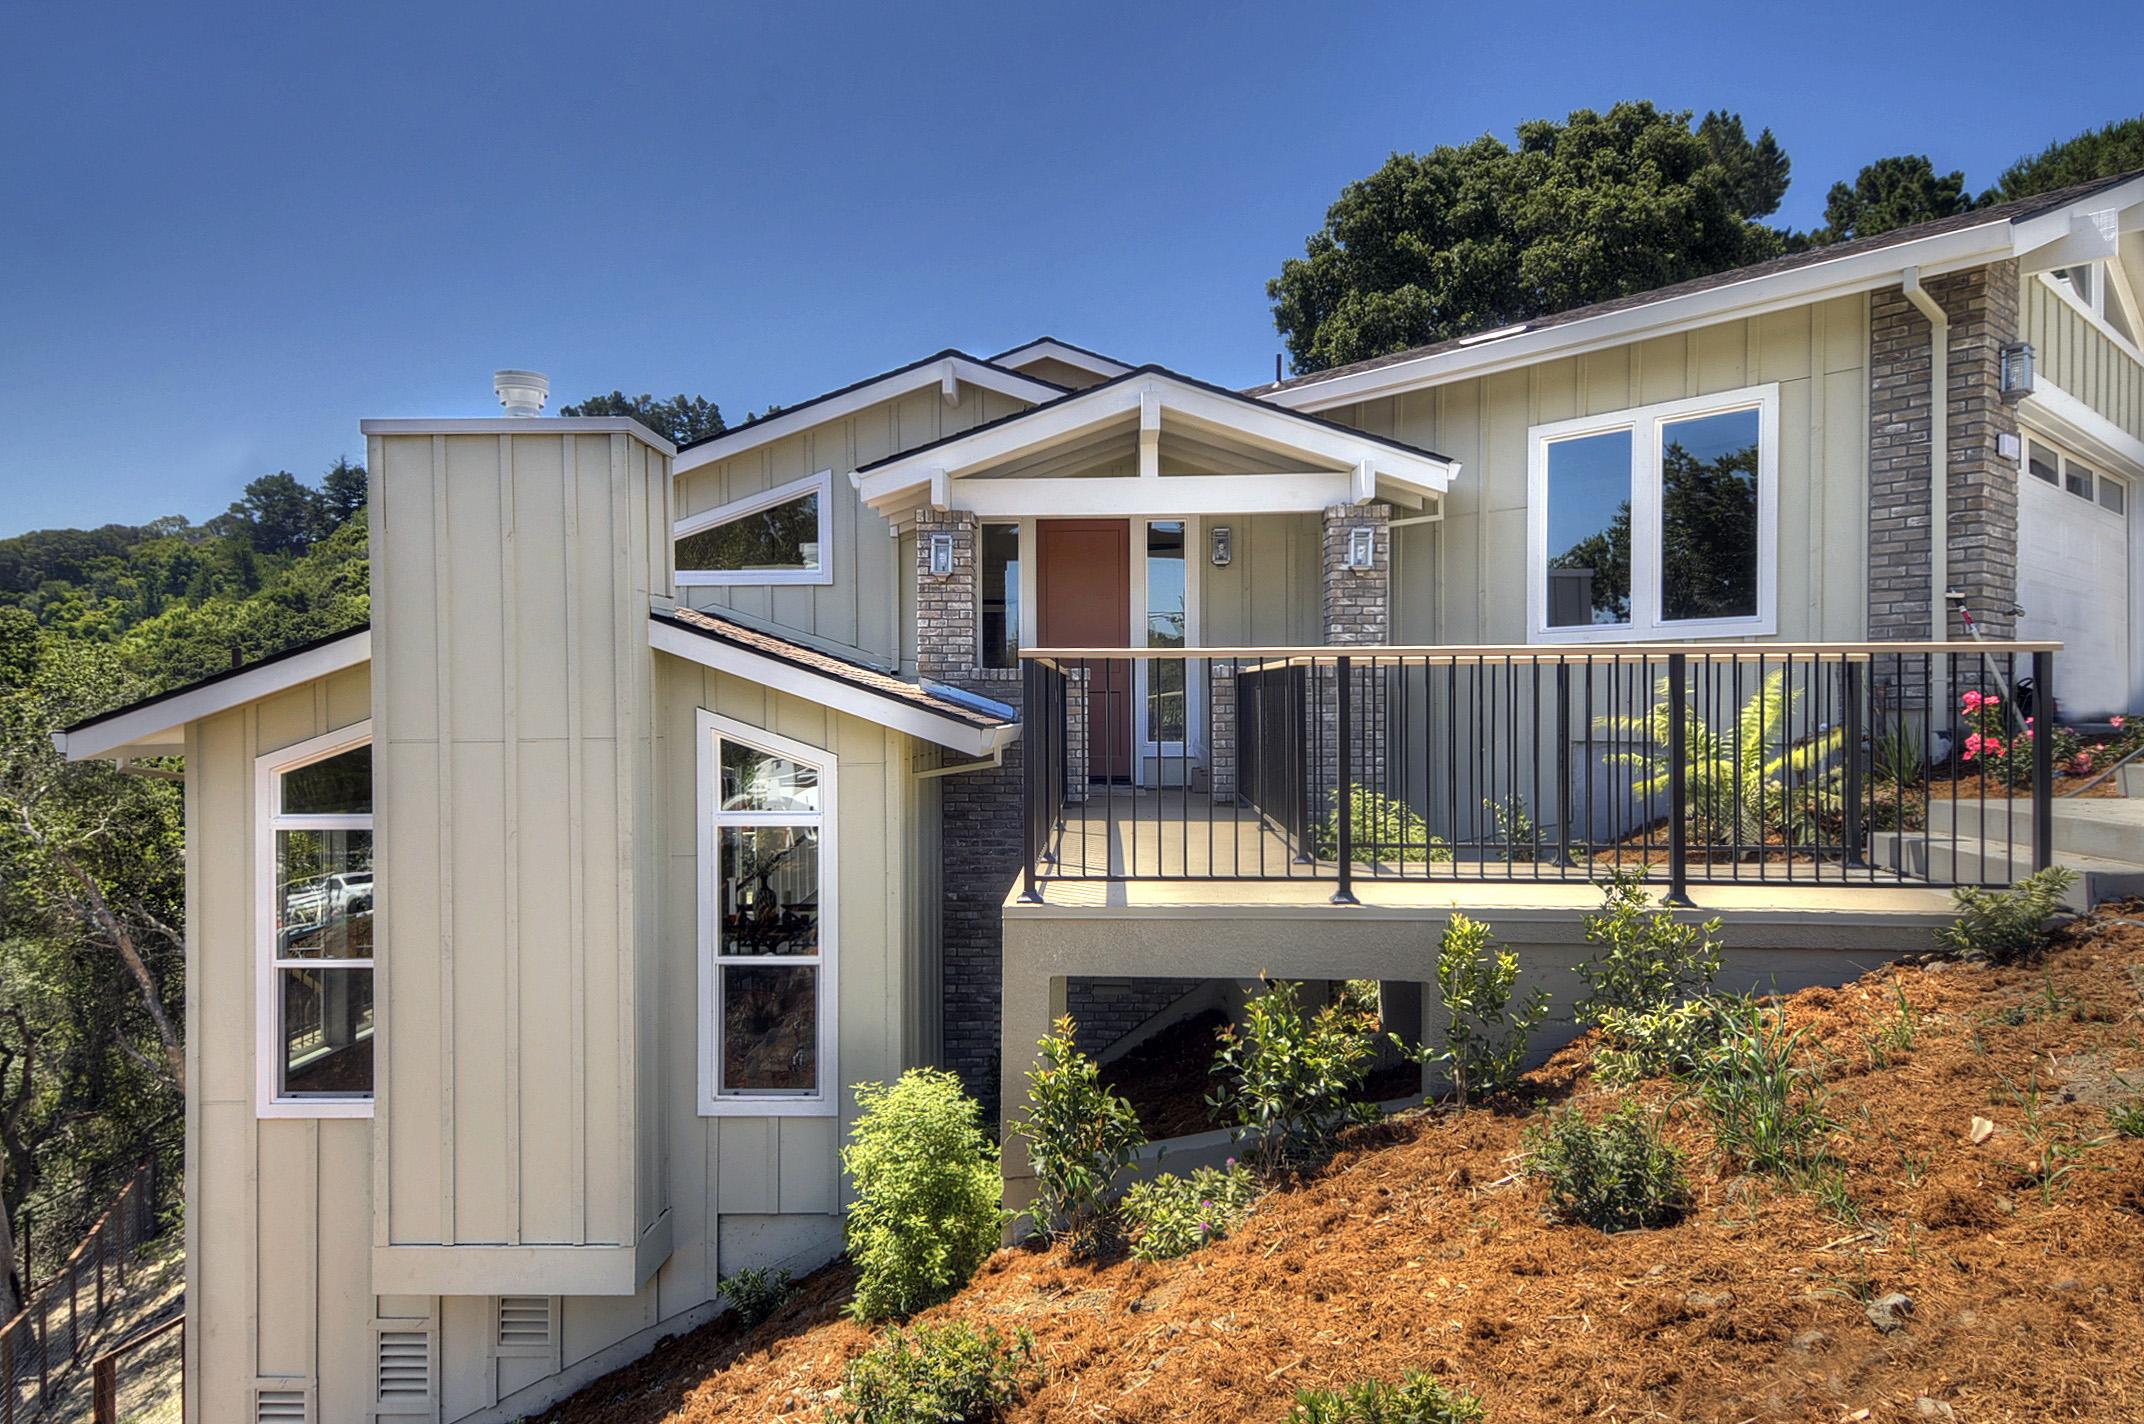 2279 Bunker Hill Dr, San Mateo, CA 94402